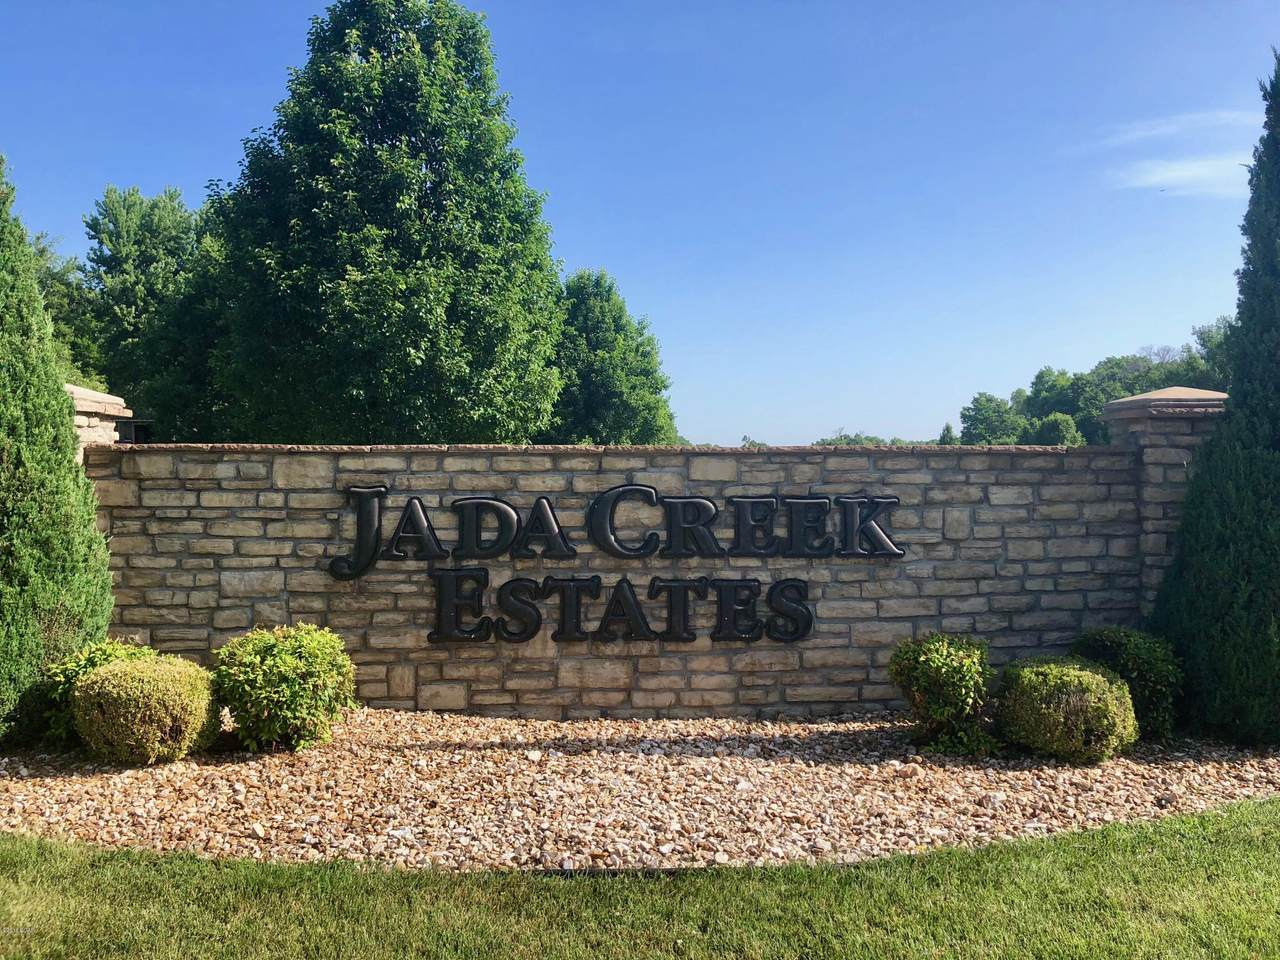 Lot 3 Jada Creek Estates - Photo 1